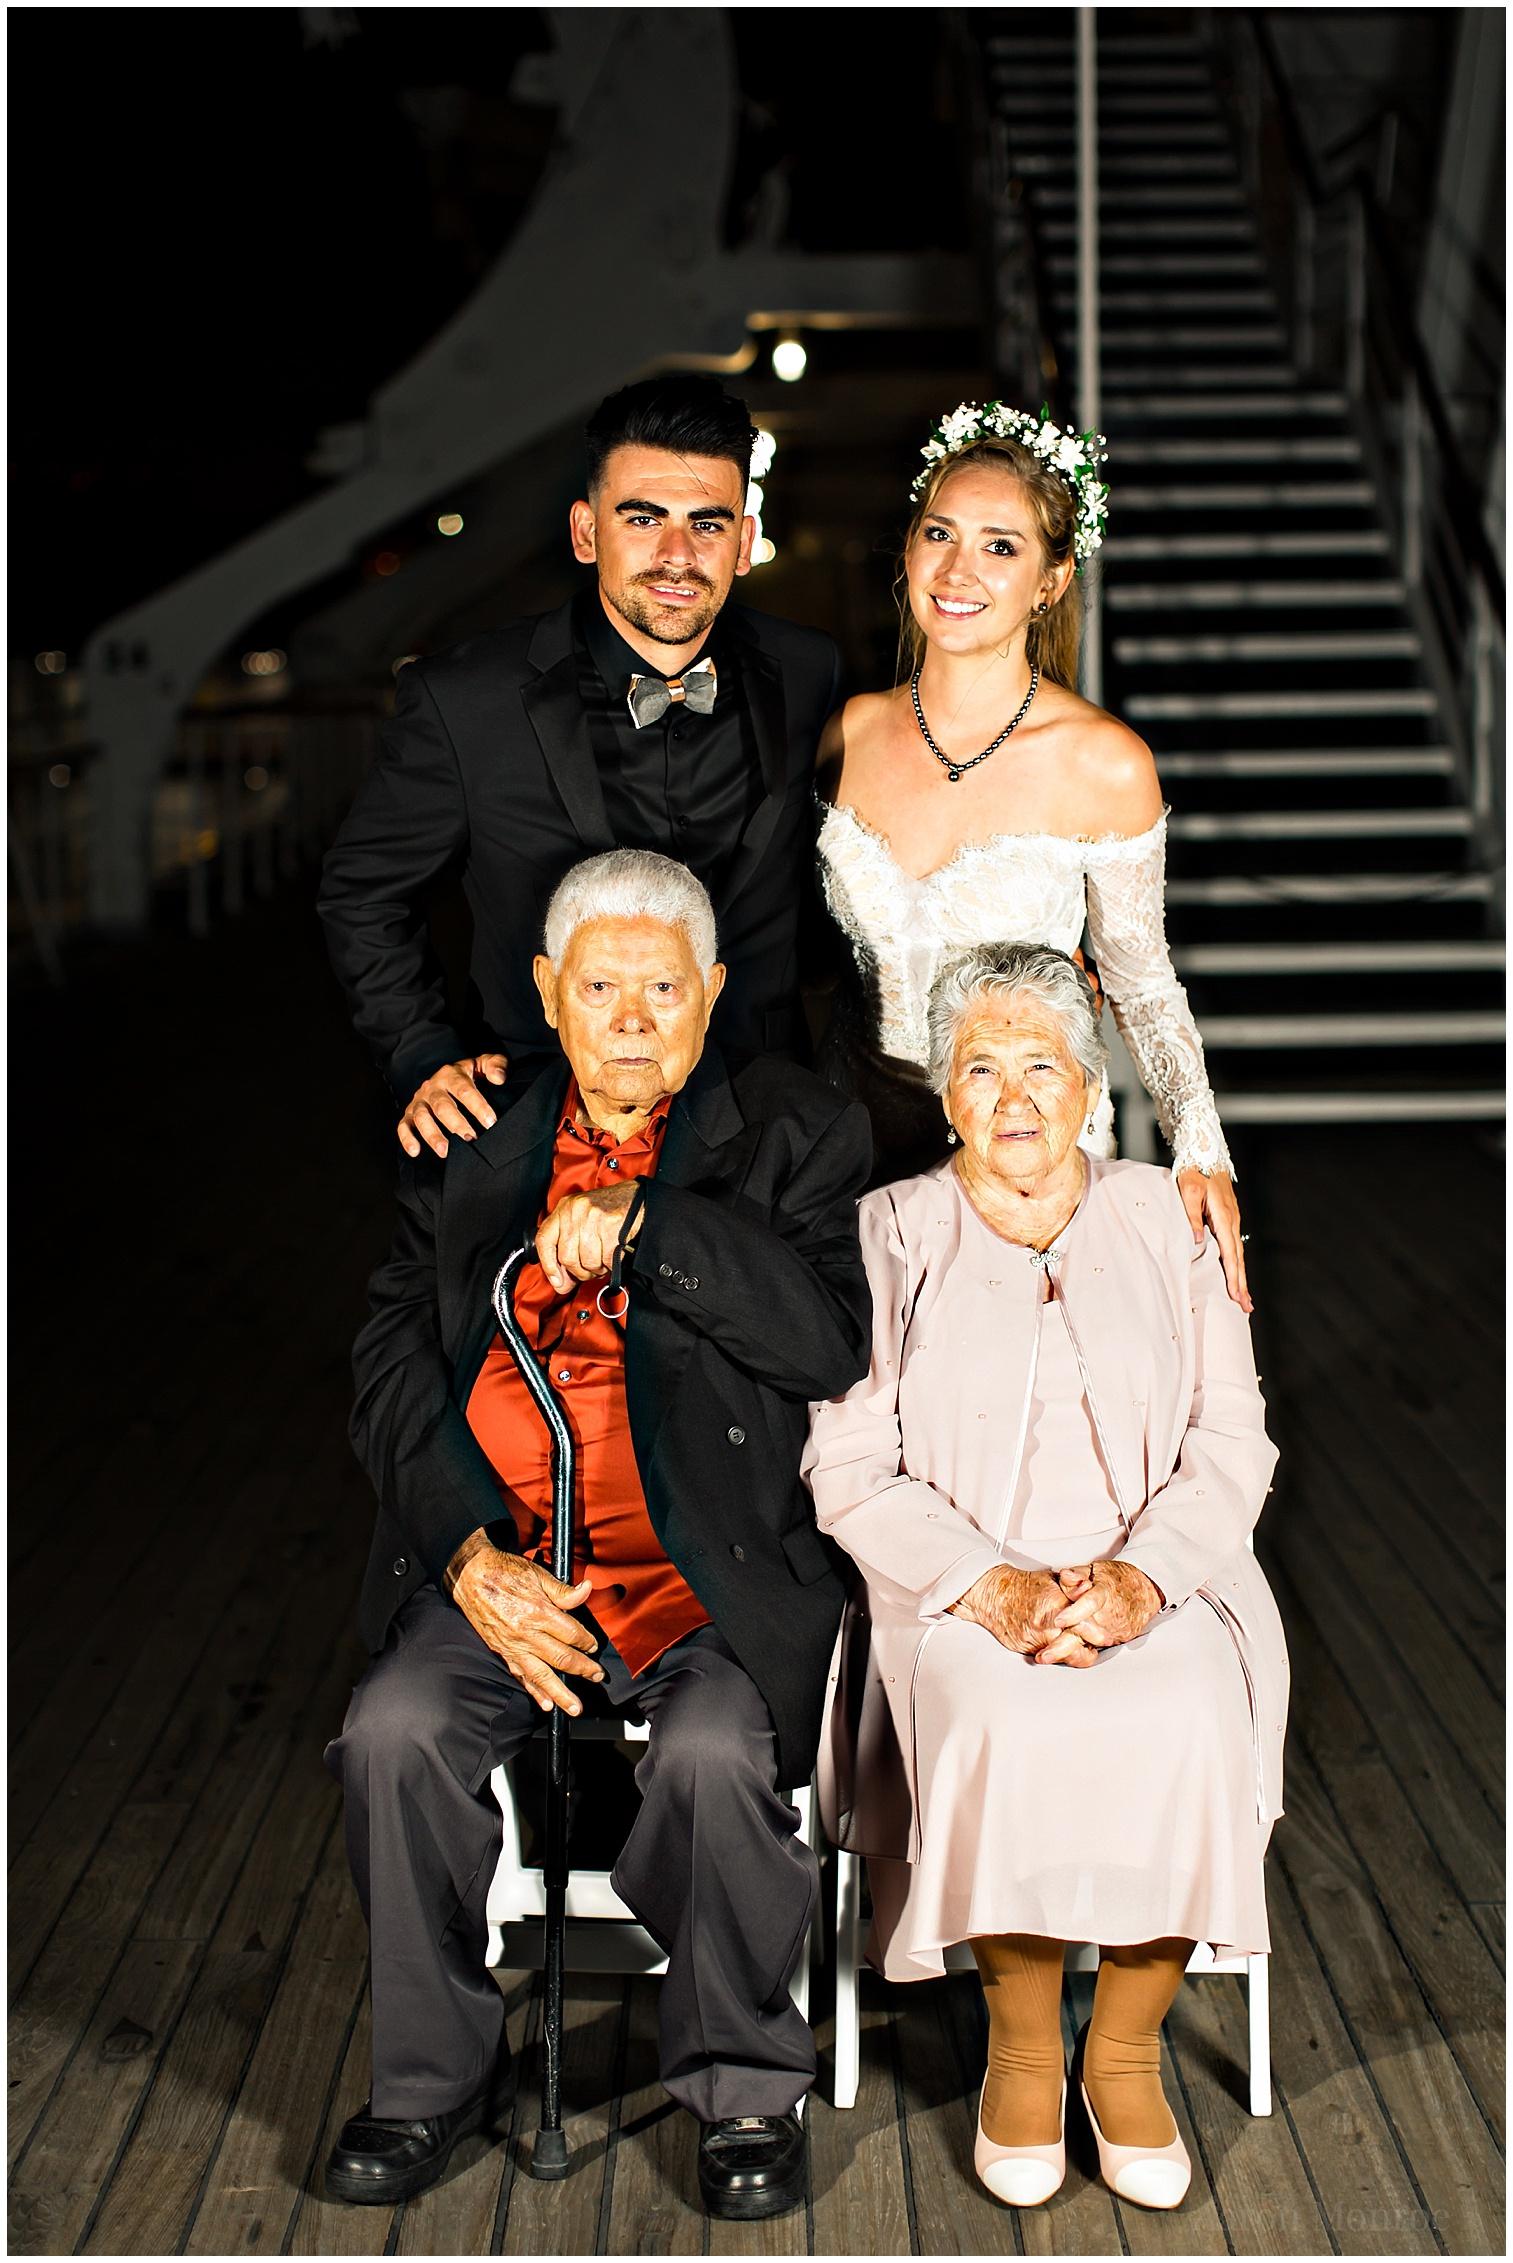 Queen_Mary_Long_Beach_Wedding_Photography_0511.jpg